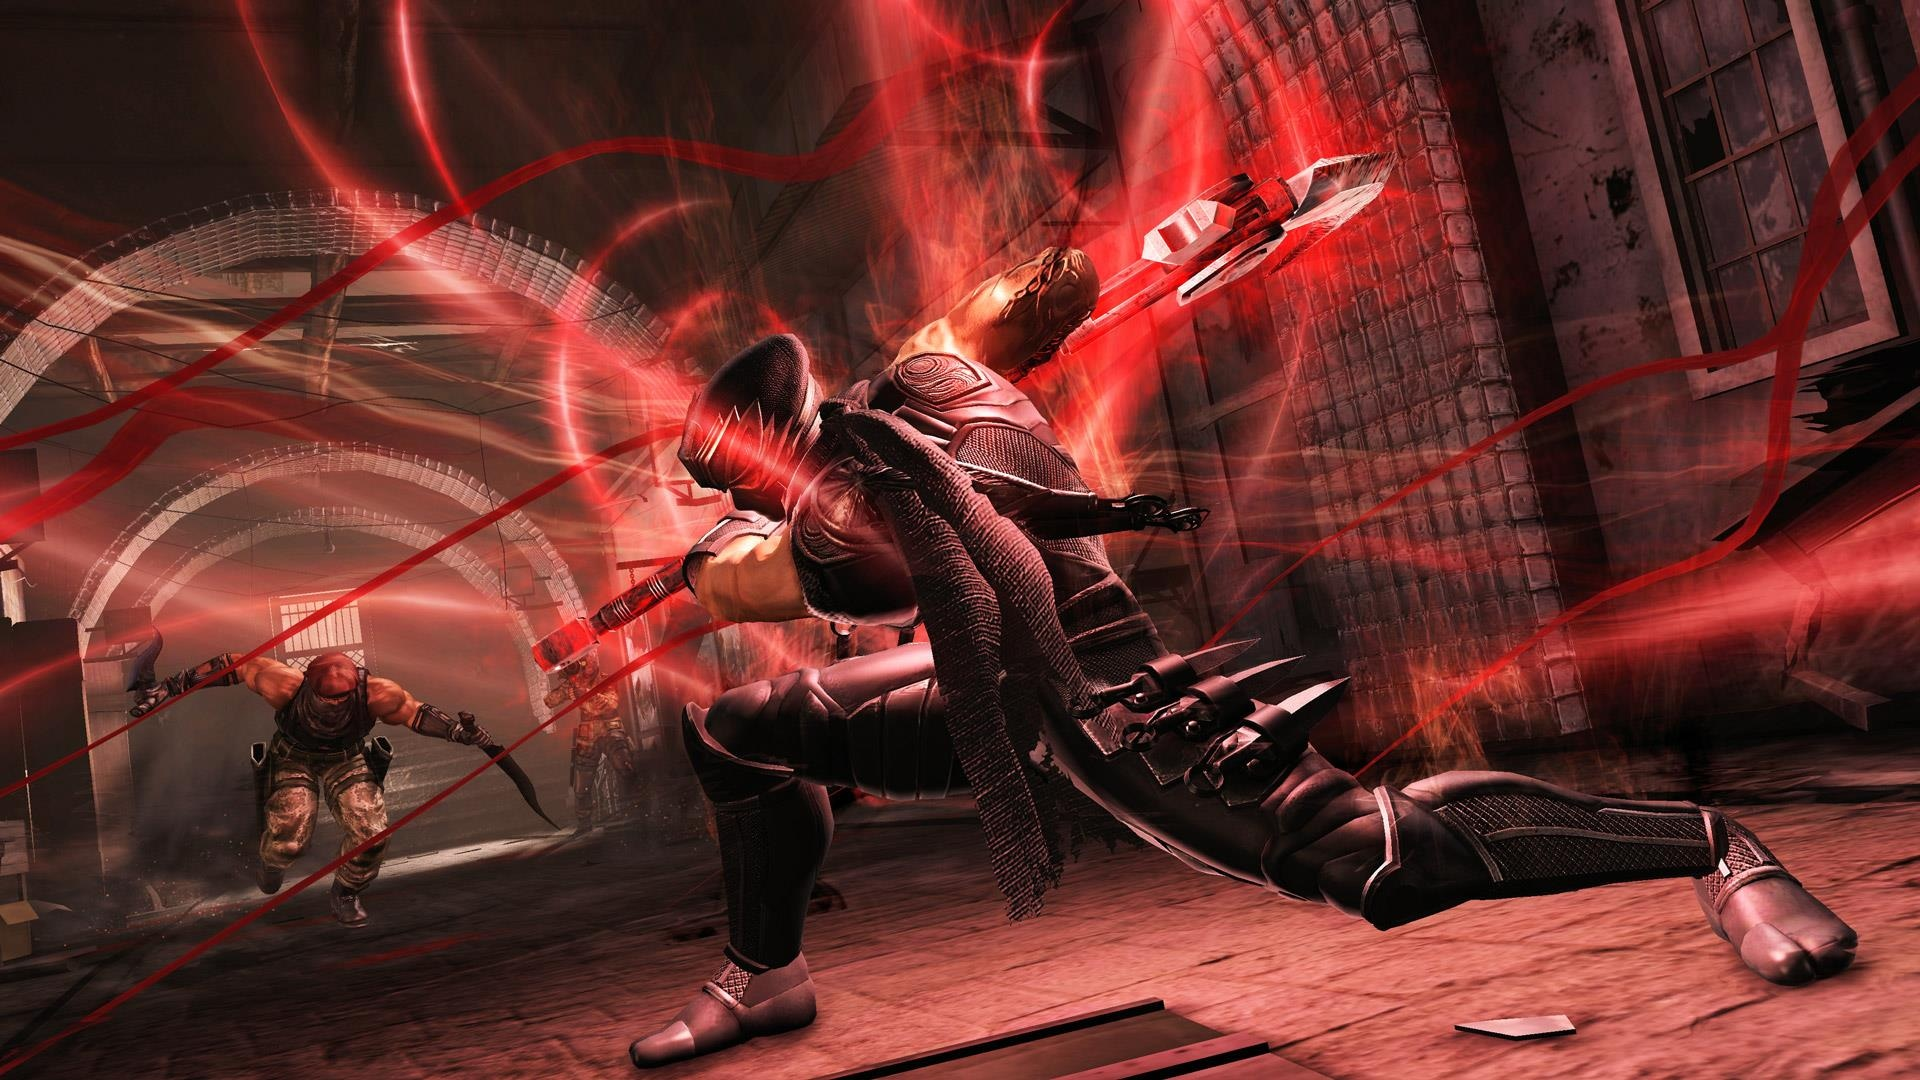 Ninja Gaiden: Master Collection coming to Xbox One in June - TrueAchievements